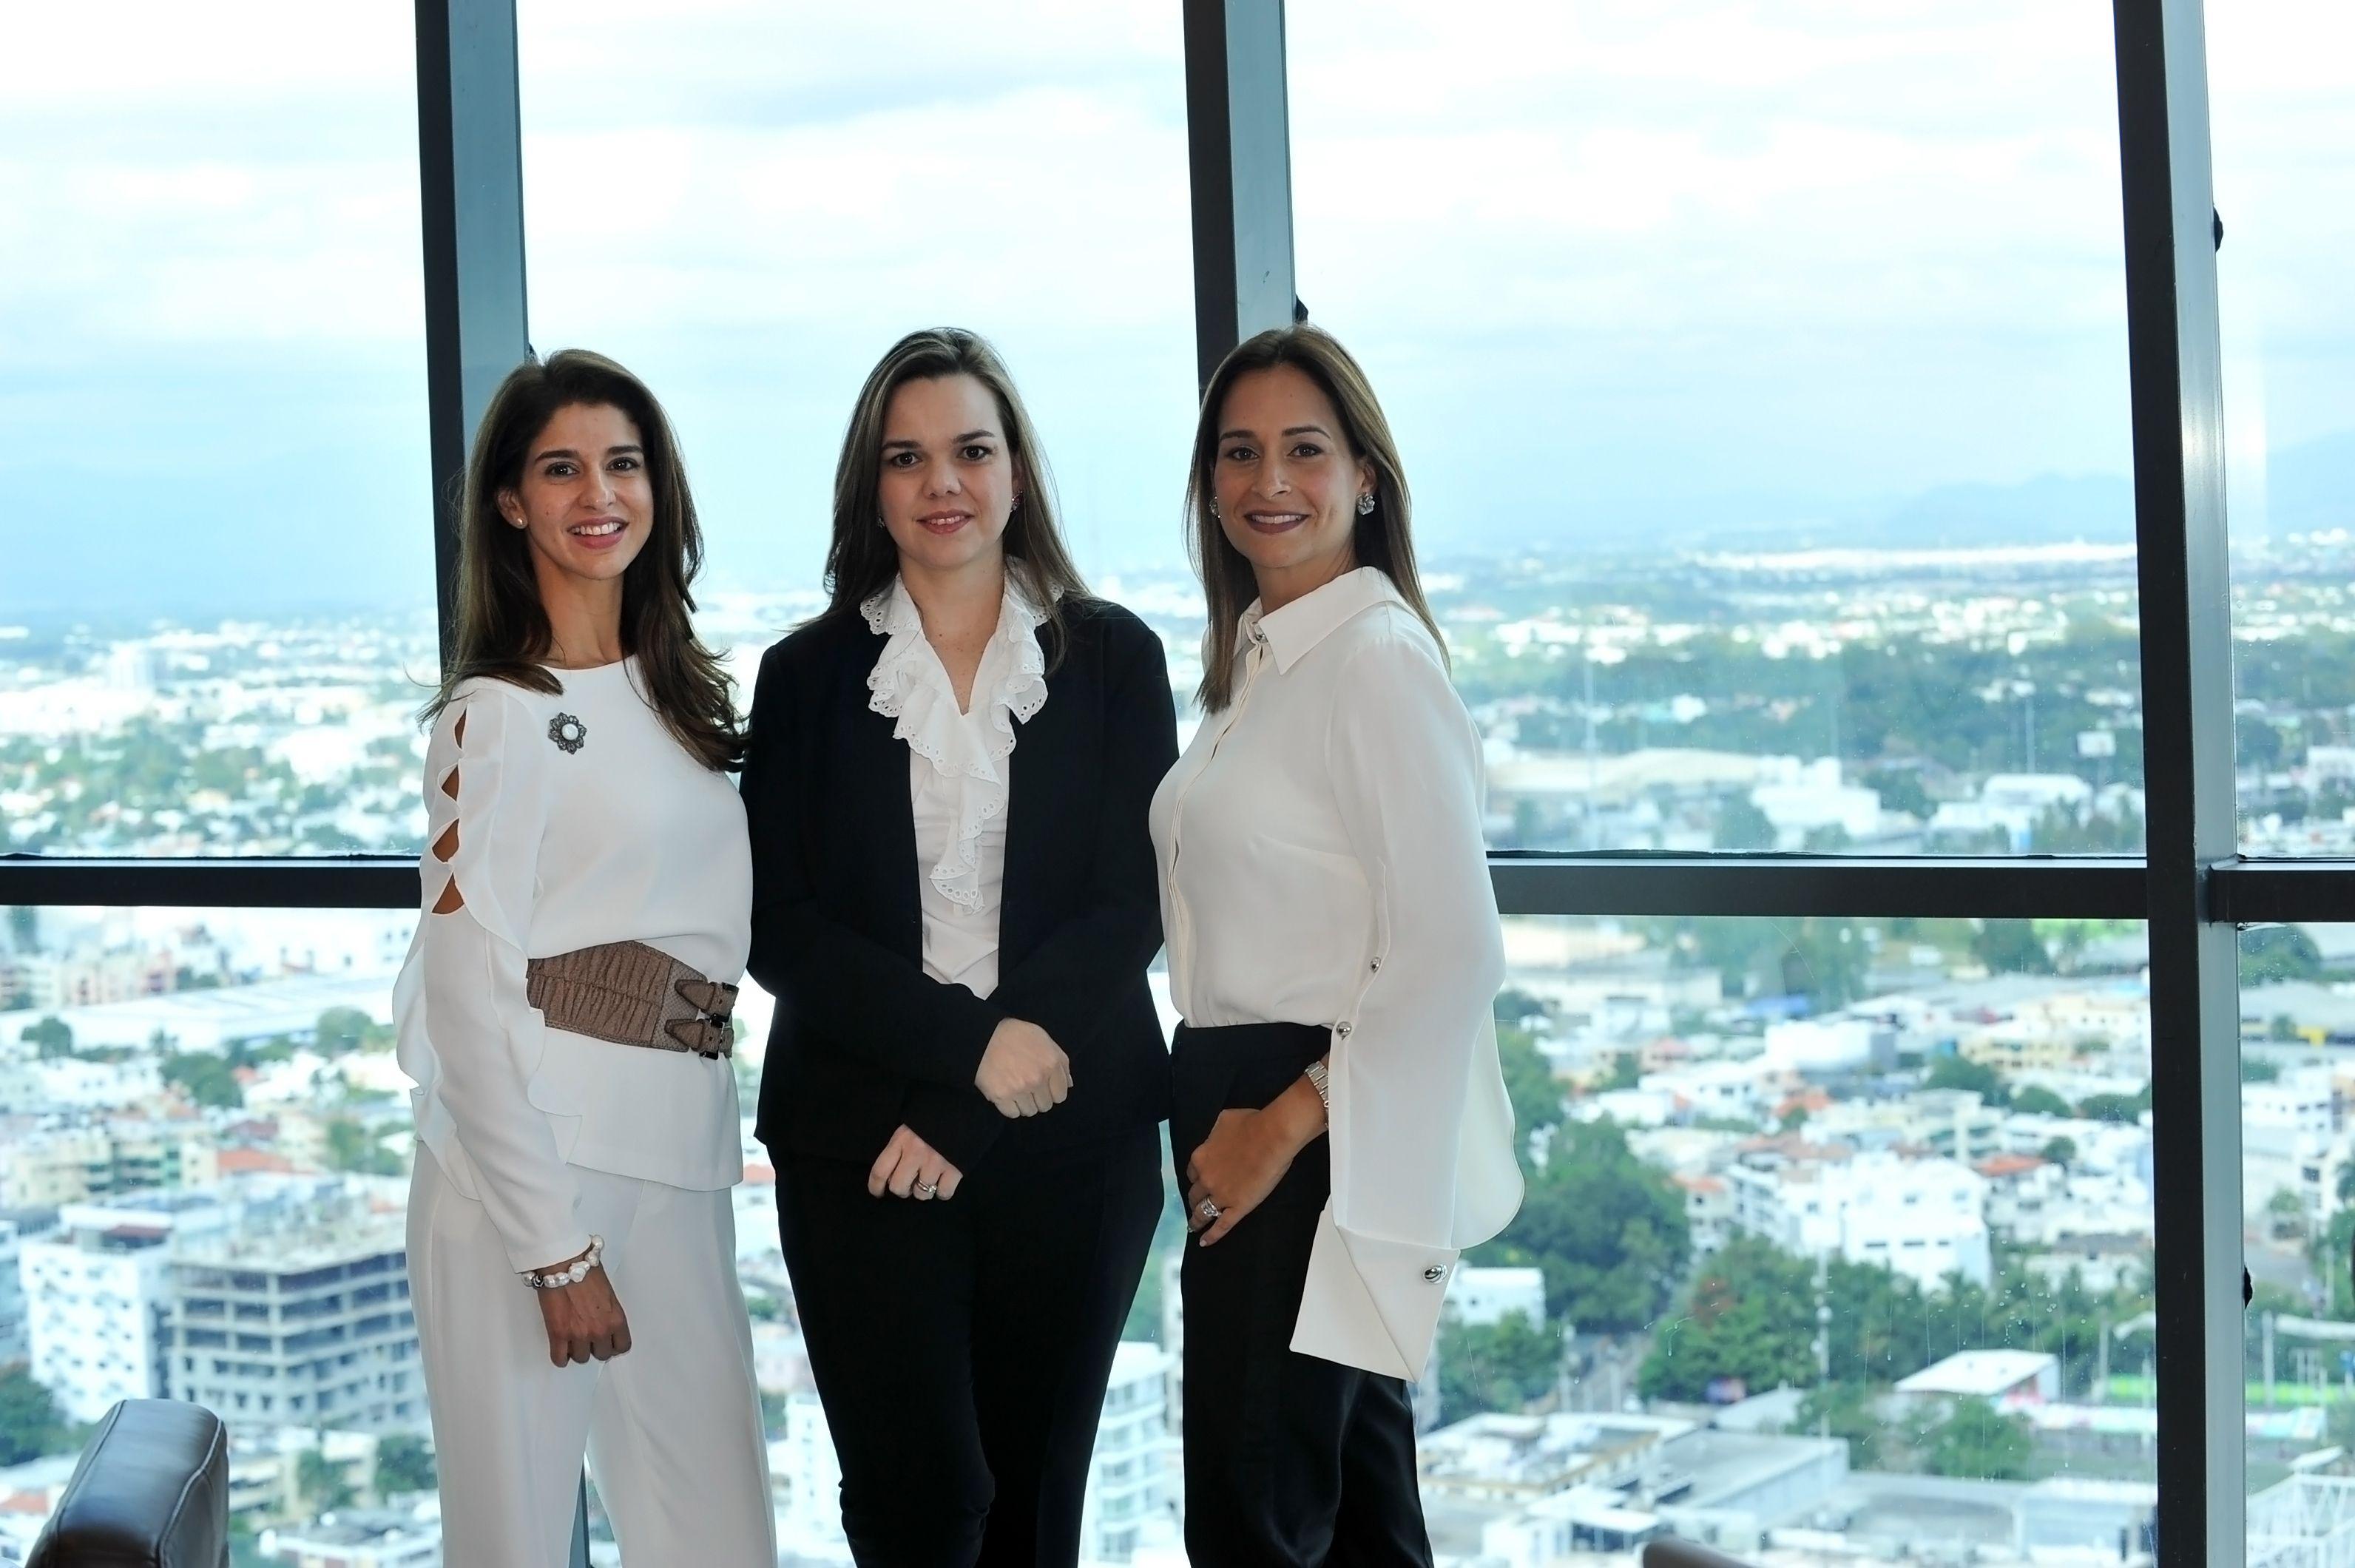 Xinara Croes,Emiliana Velutini y Wendy Durán